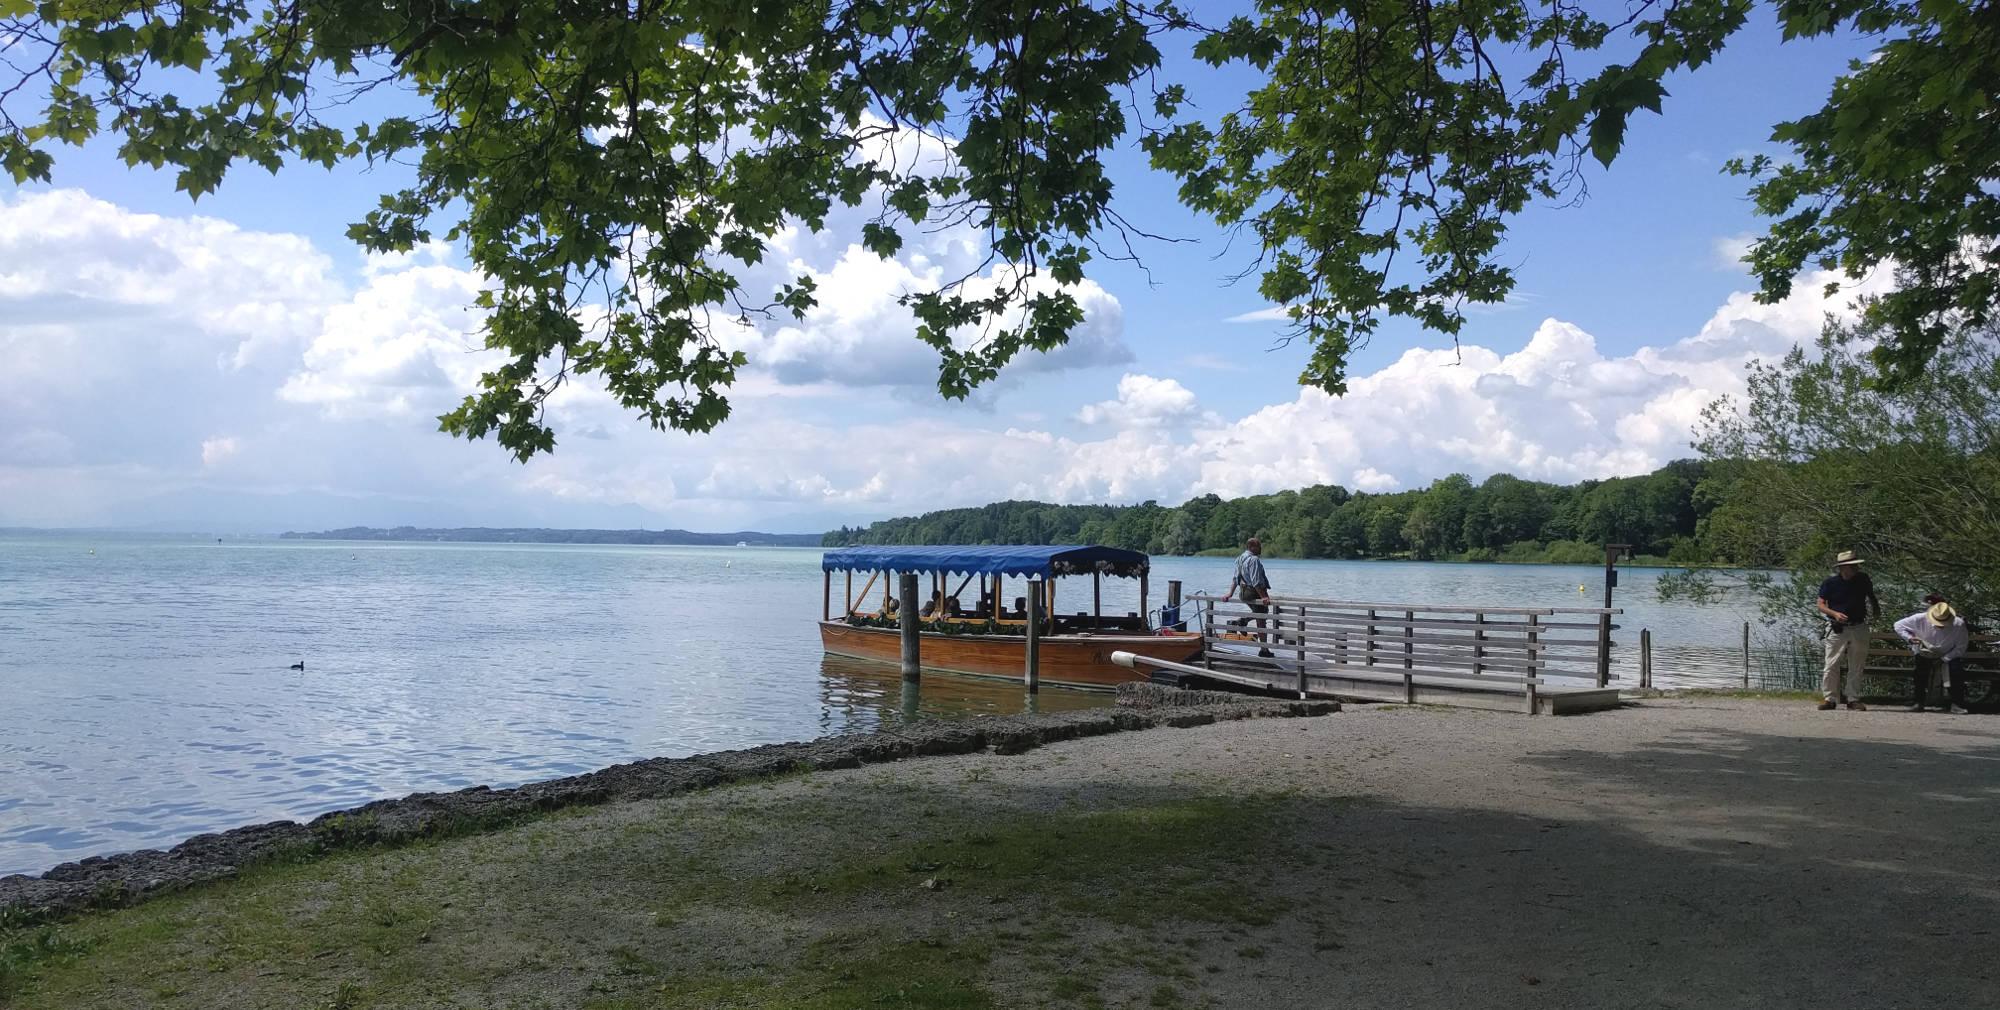 Roseninsel Fähre am Starnberger See